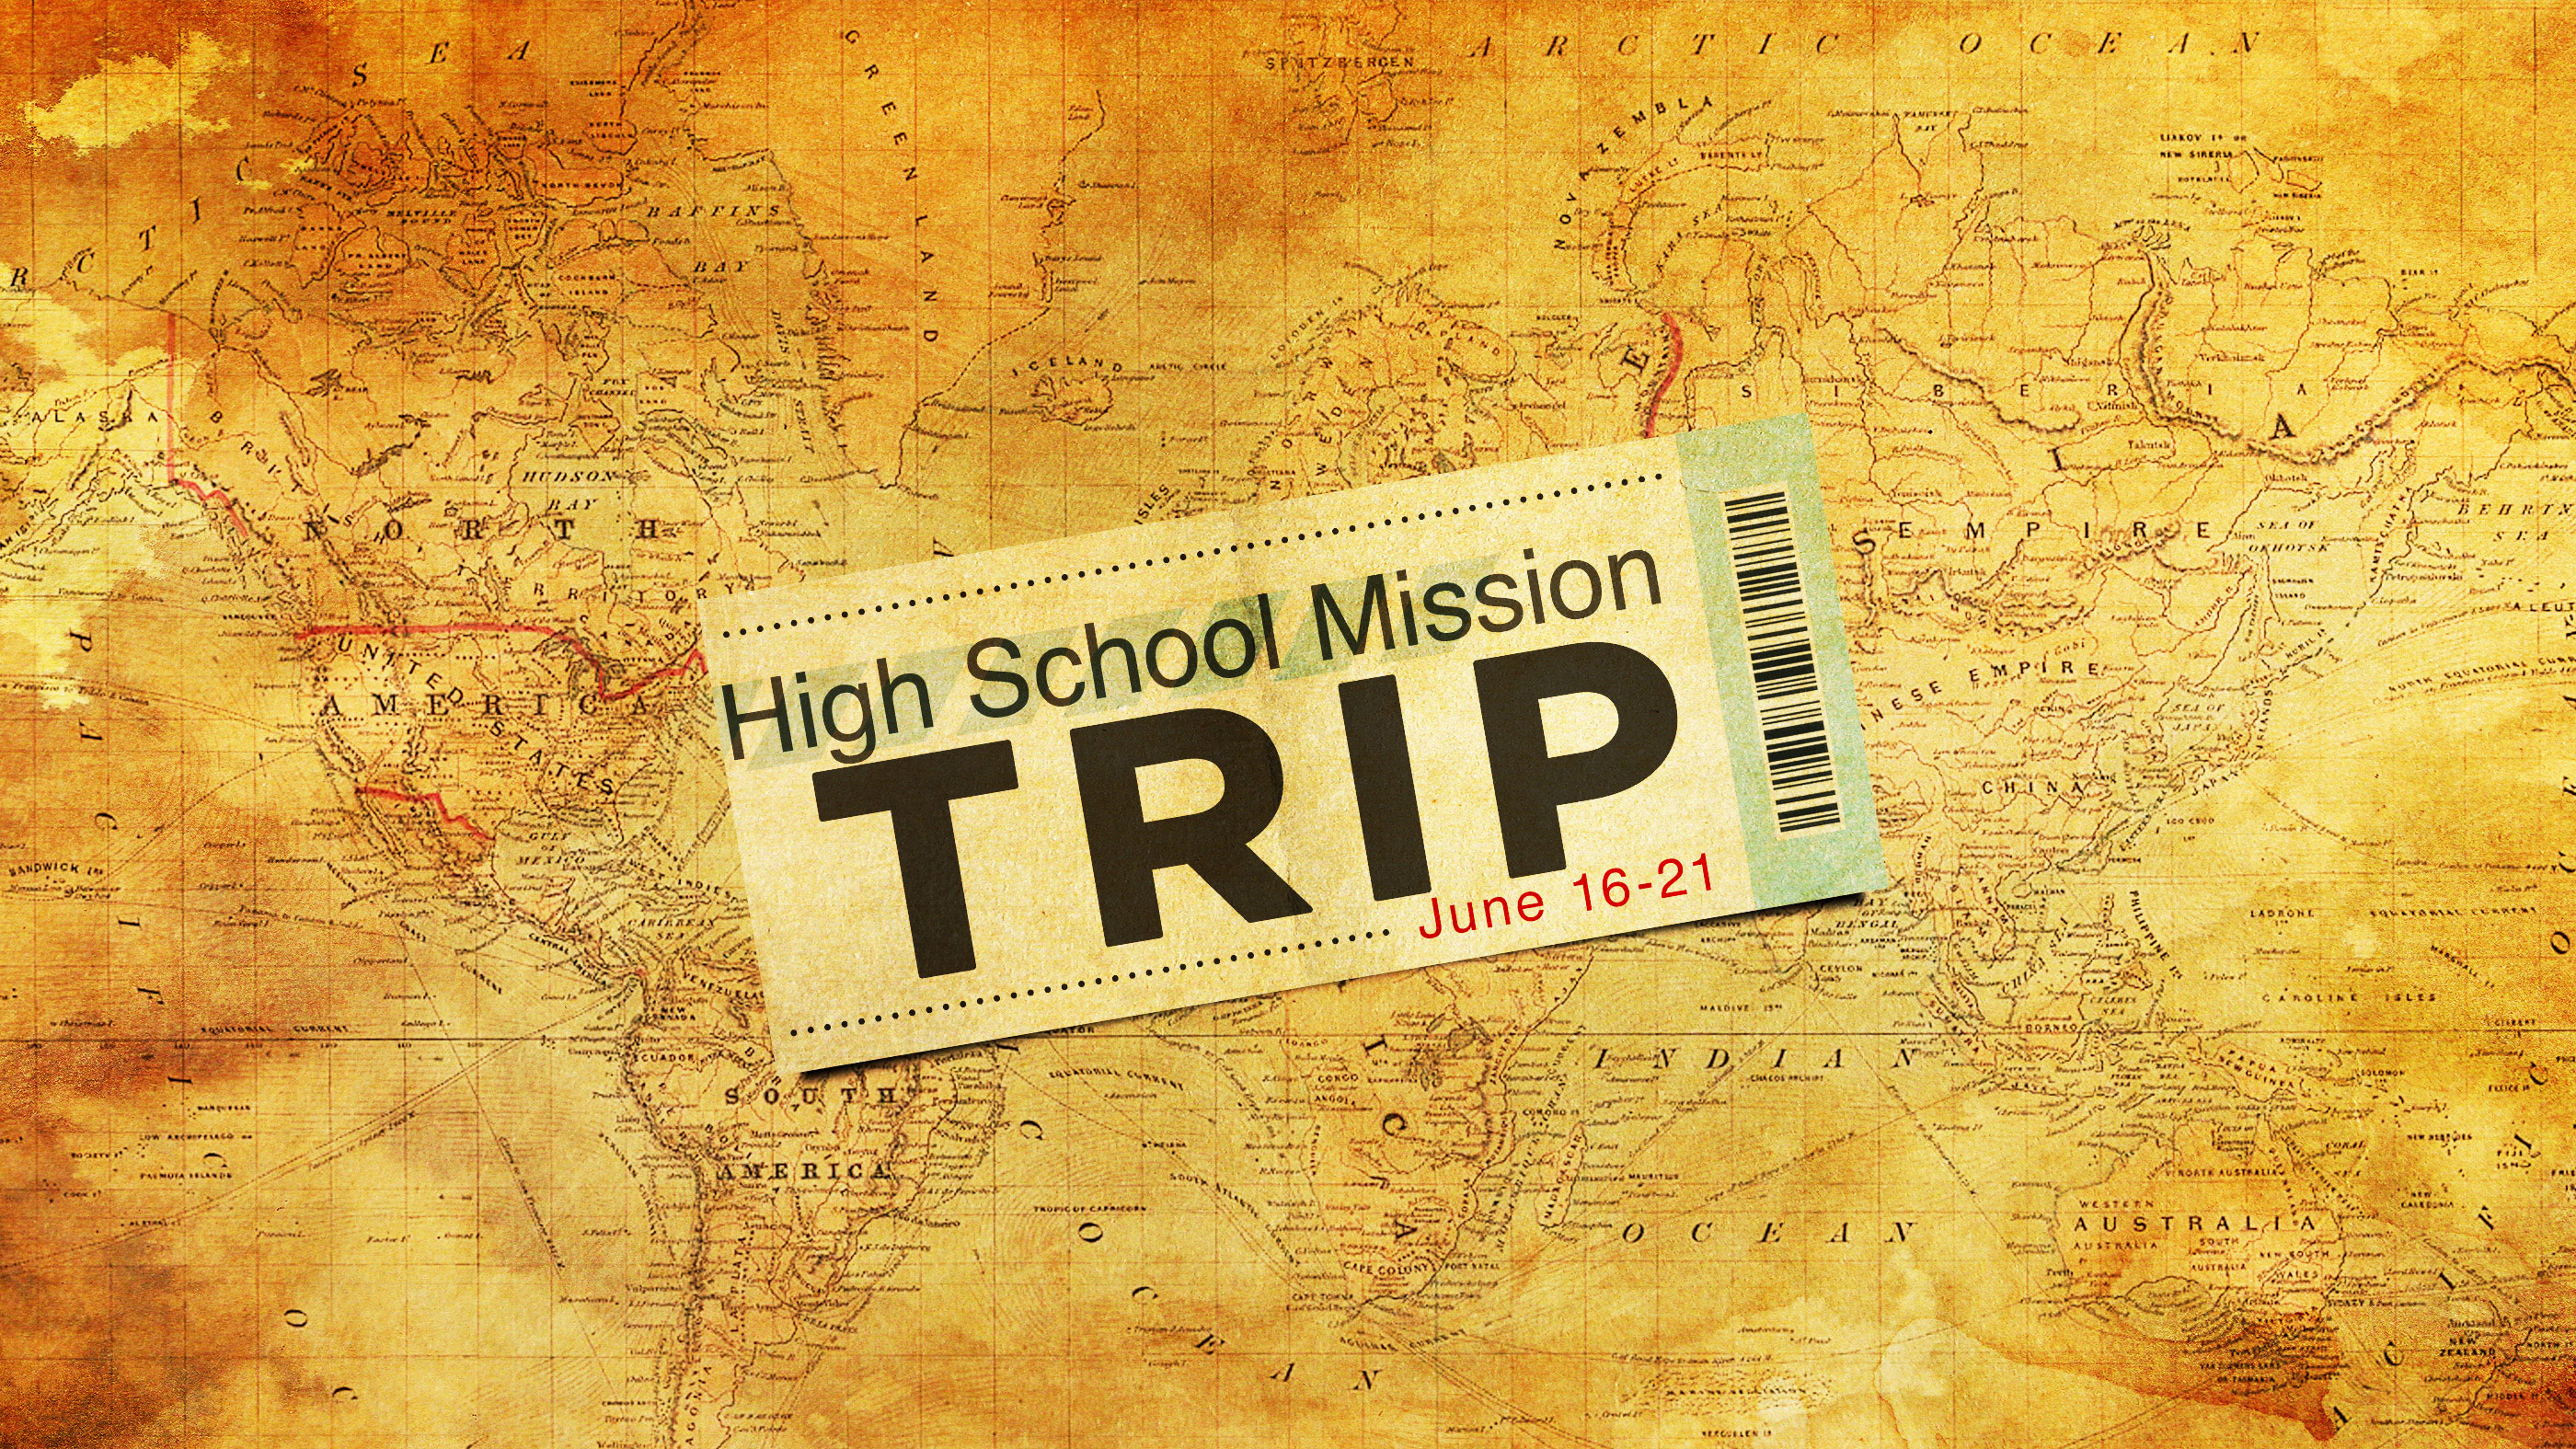 Mission San Jose, San Antonio: Hours, Address, Mission San Jose Reviews: 5/5